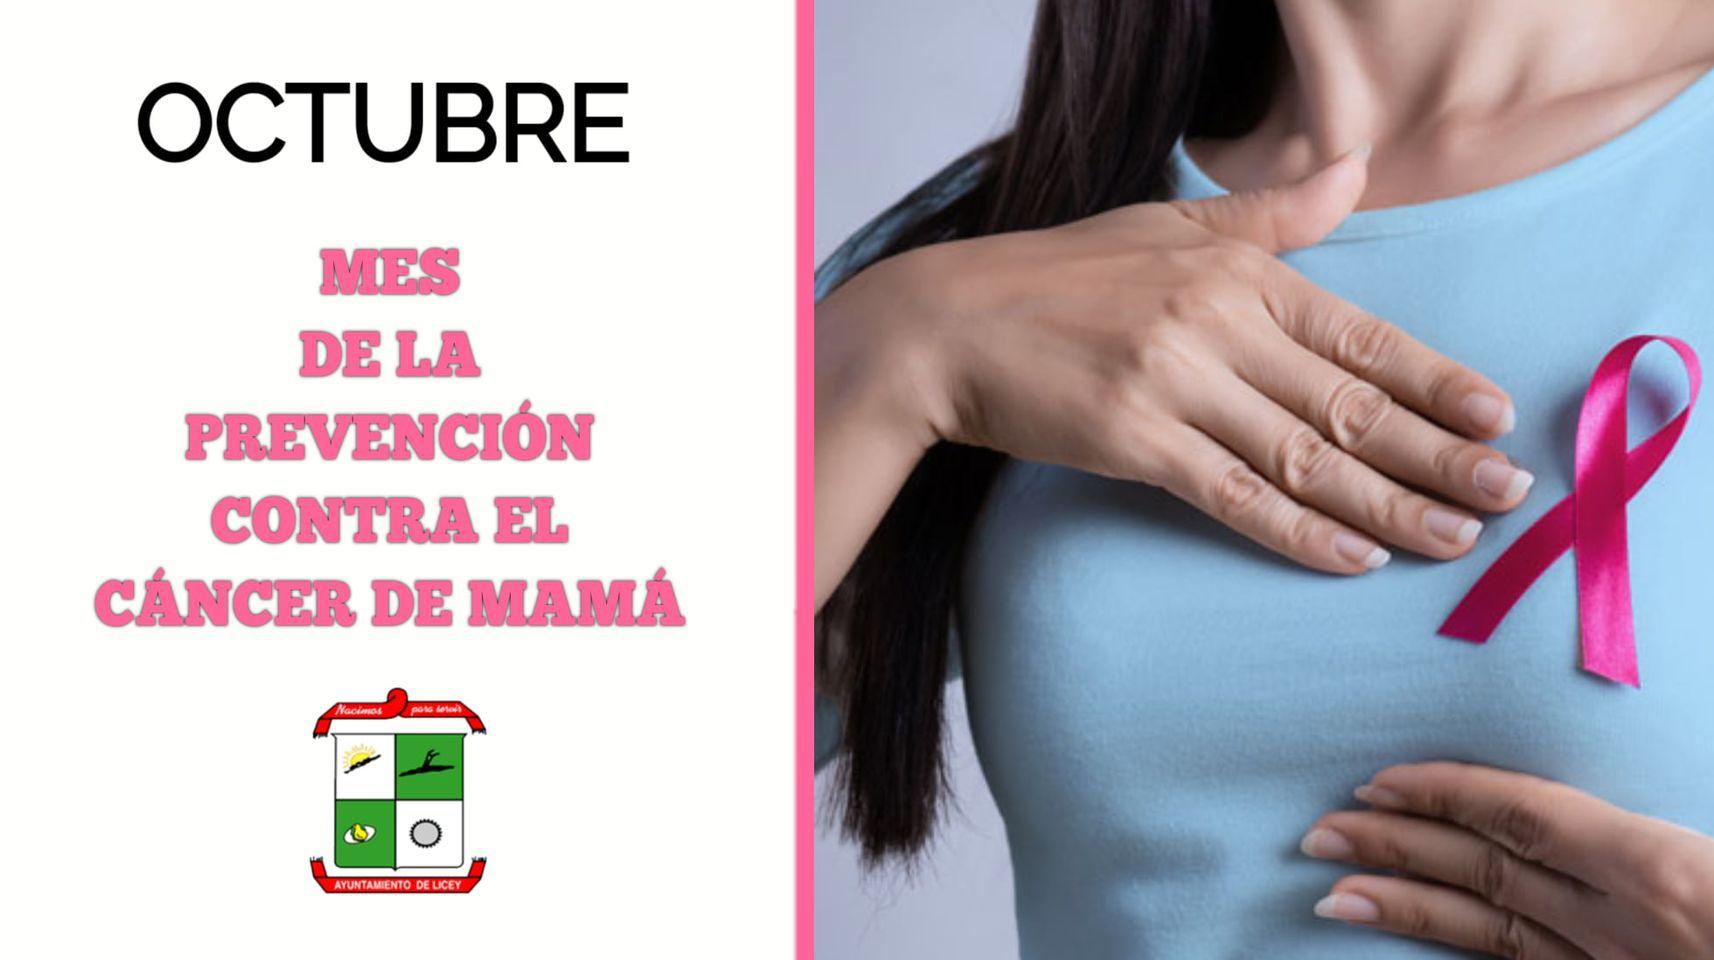 OCTUBRE, MES DE LA PREVENCION CONTRA EL CANCER DE MAMA